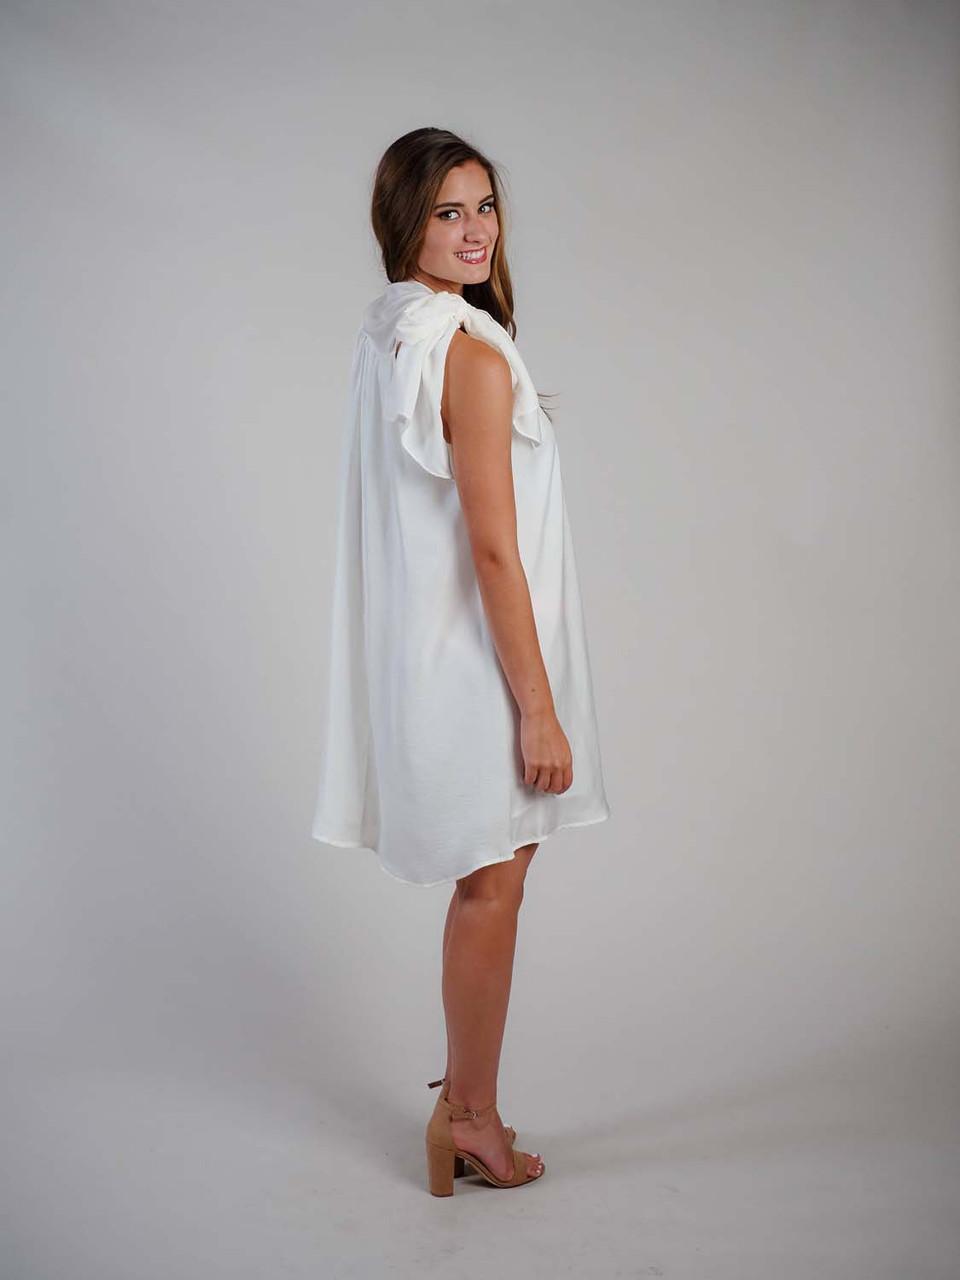 ivory white dress with large neck bow